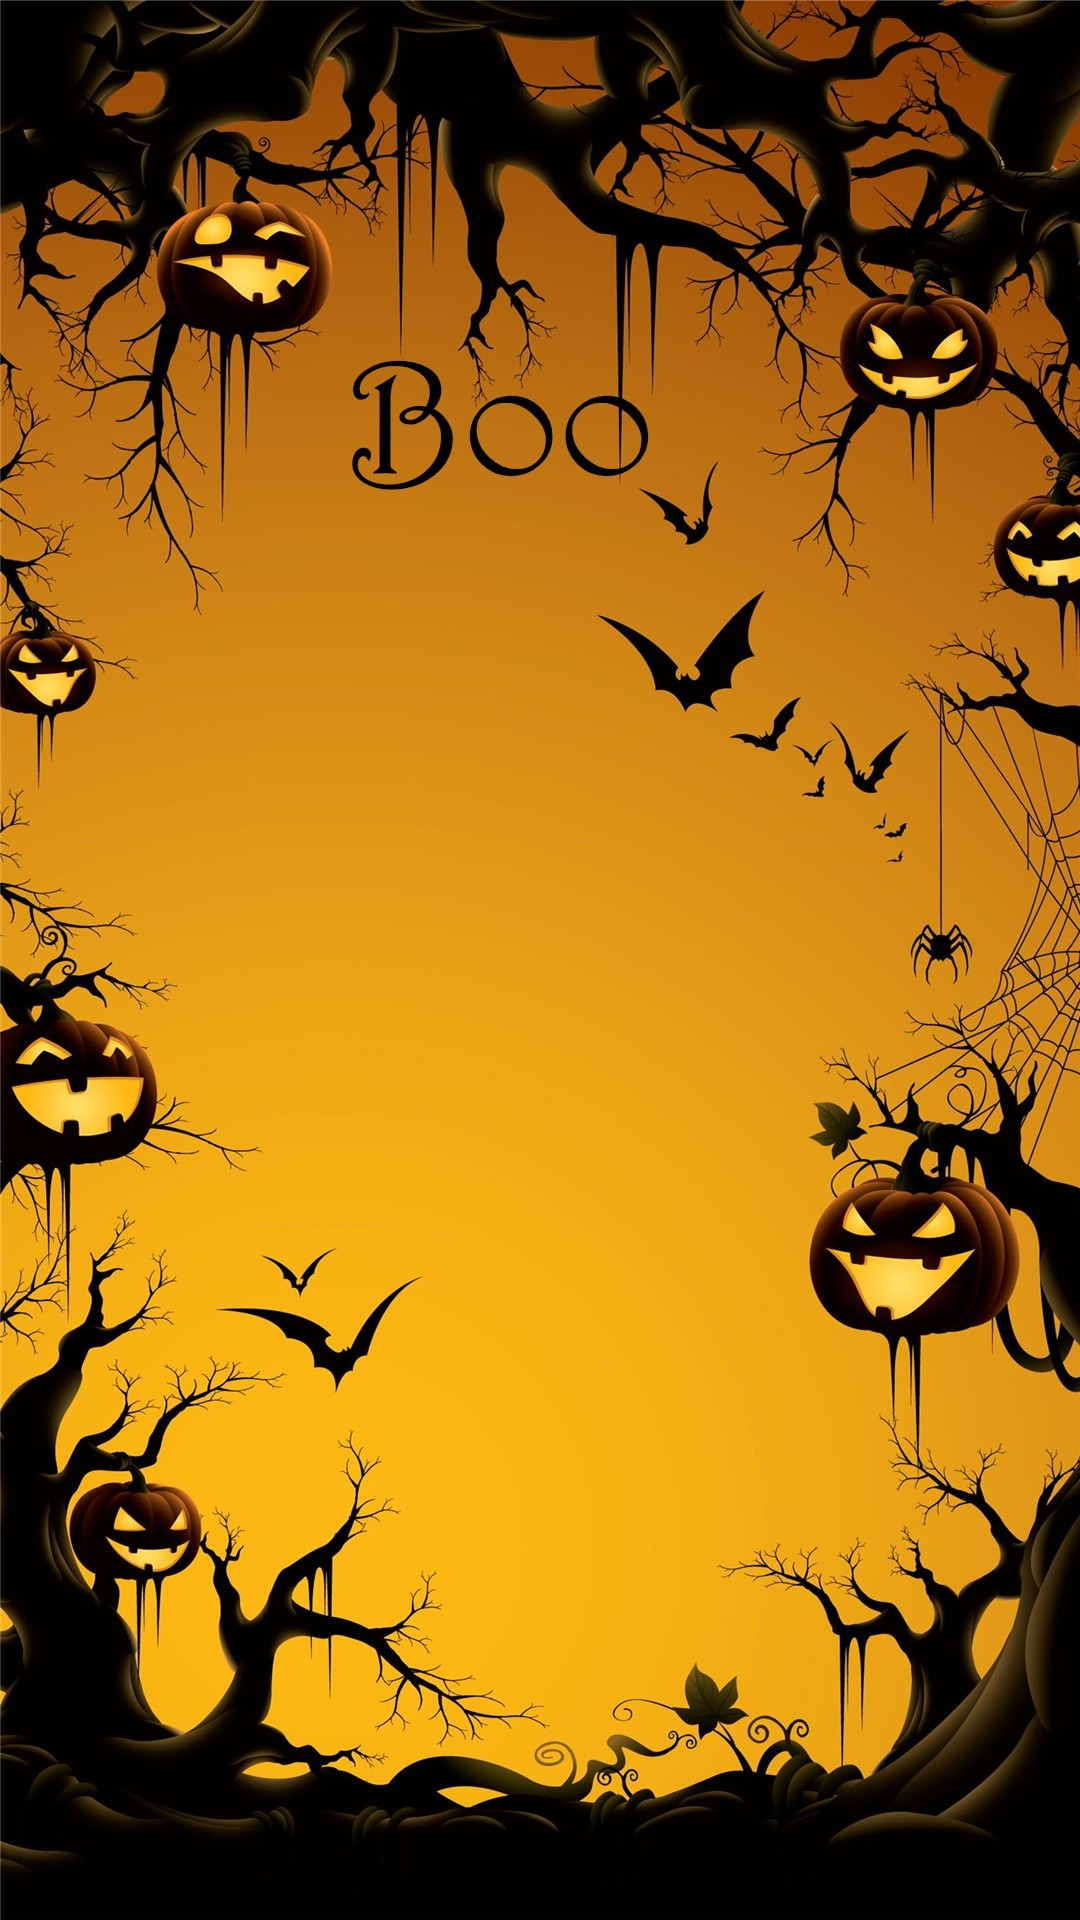 silhouette halloween scary sunset leaf bat creepy vector illustration